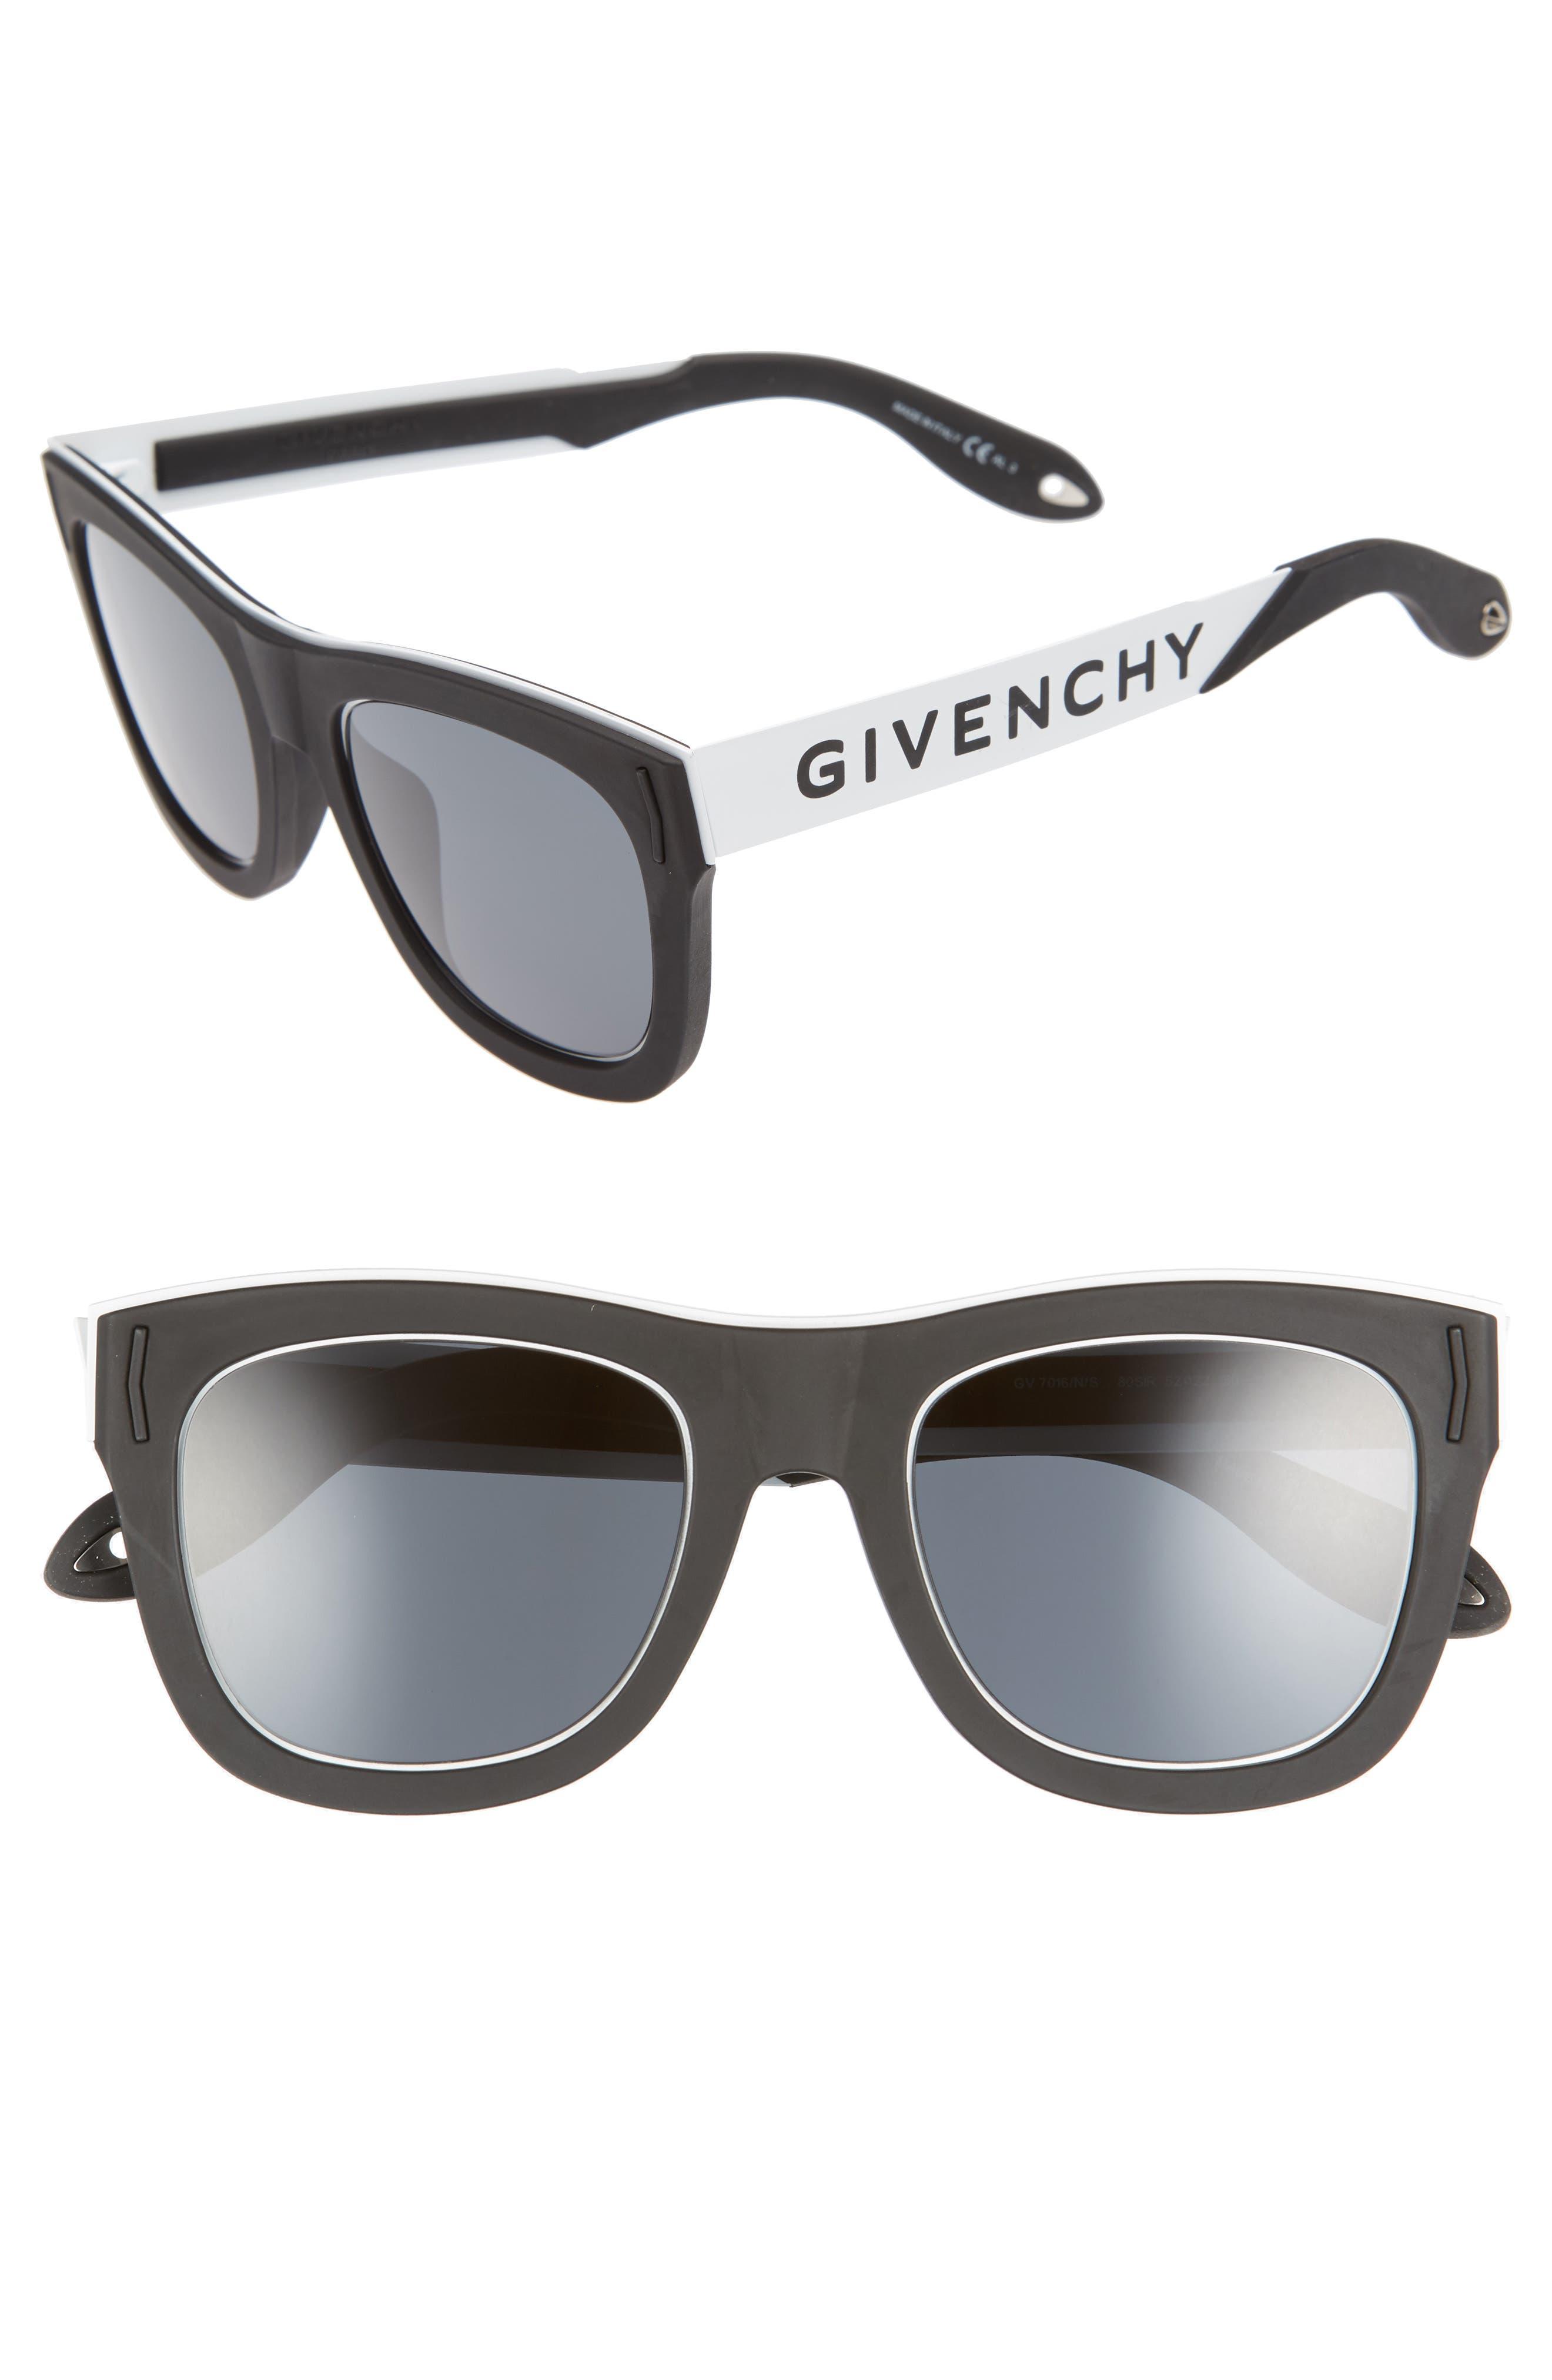 Main Image - Givenchy 52mm Mirrored Rectangular Sunglasses